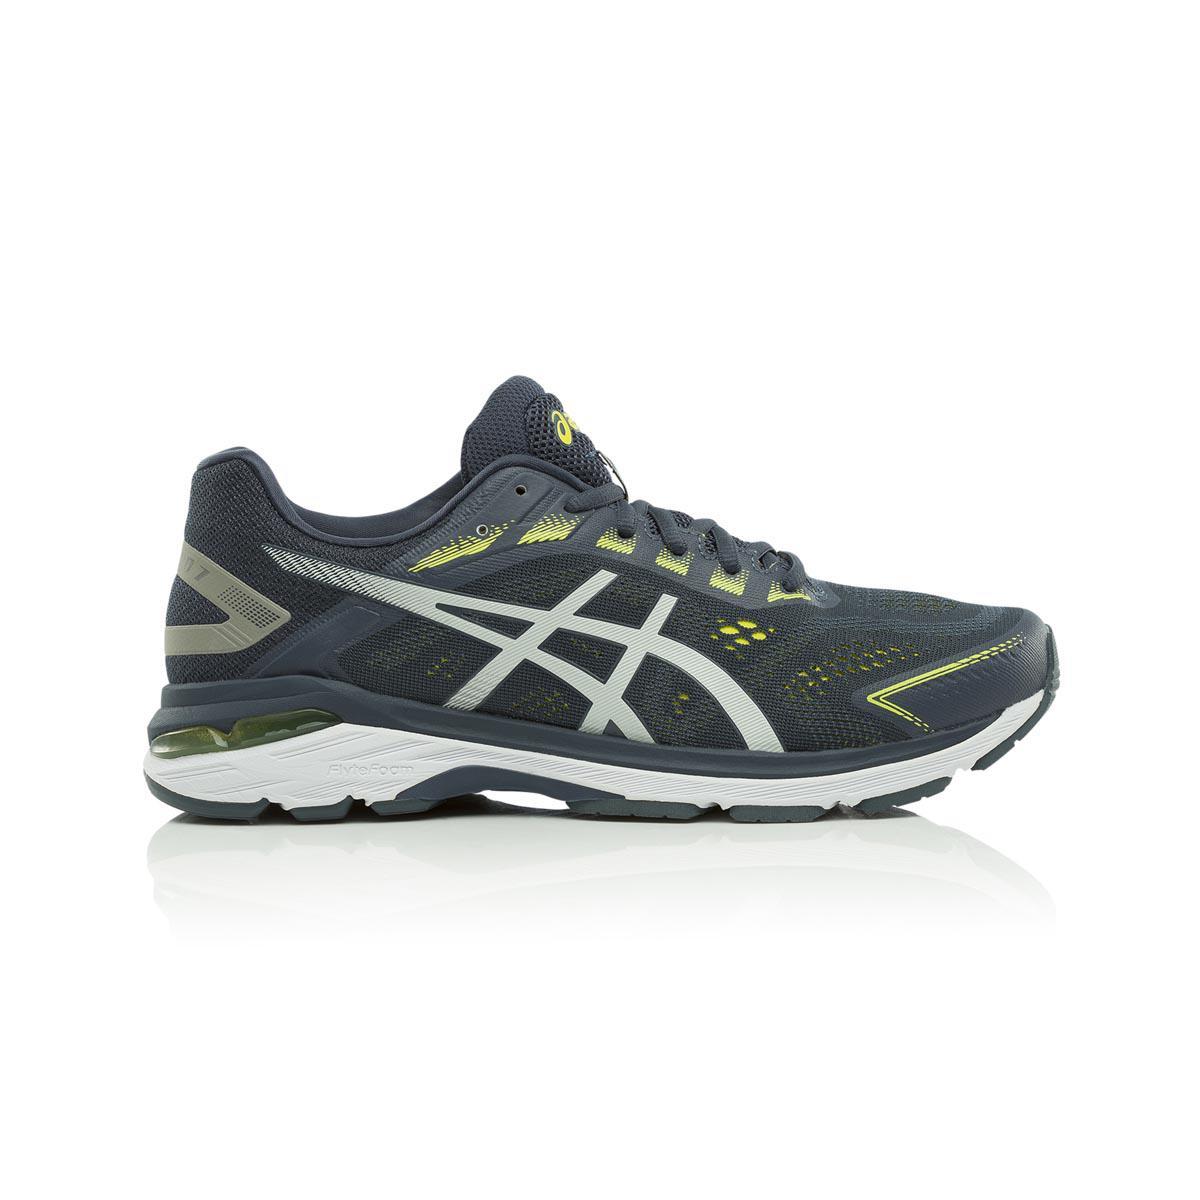 Asics GT 2000 7 Running Shoes